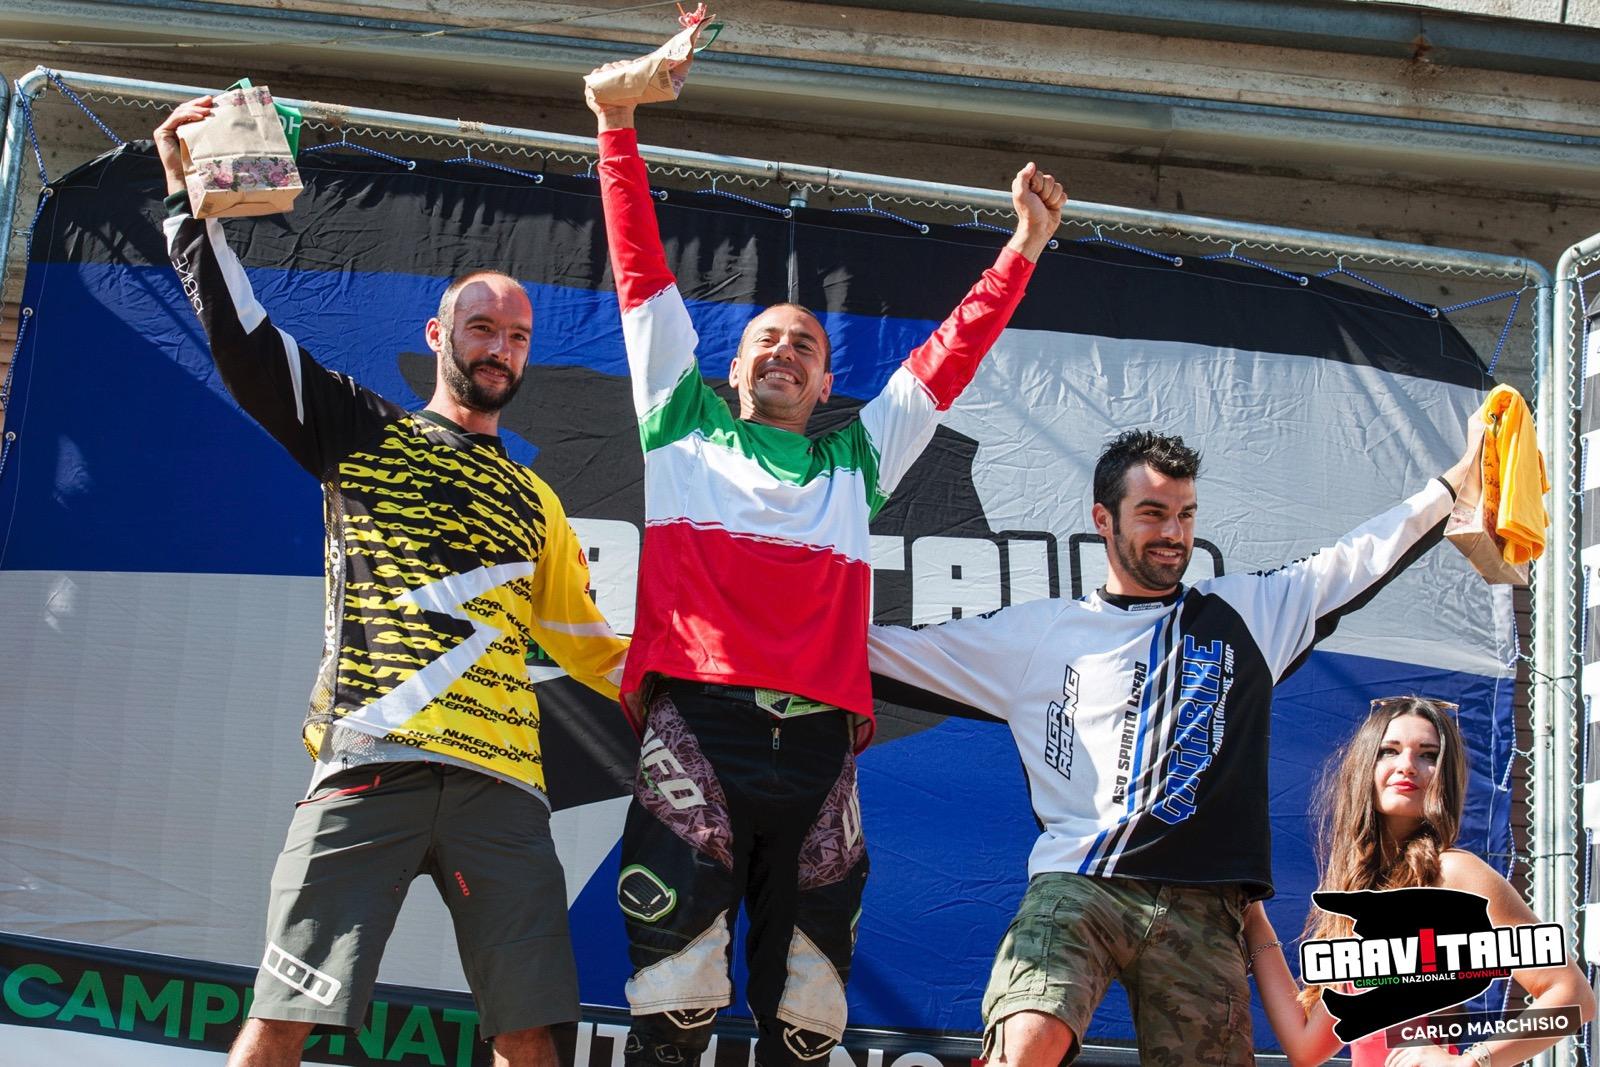 PhotoCarloMarchisio_GIT2015_CampionatiItaliani_Sestola_060